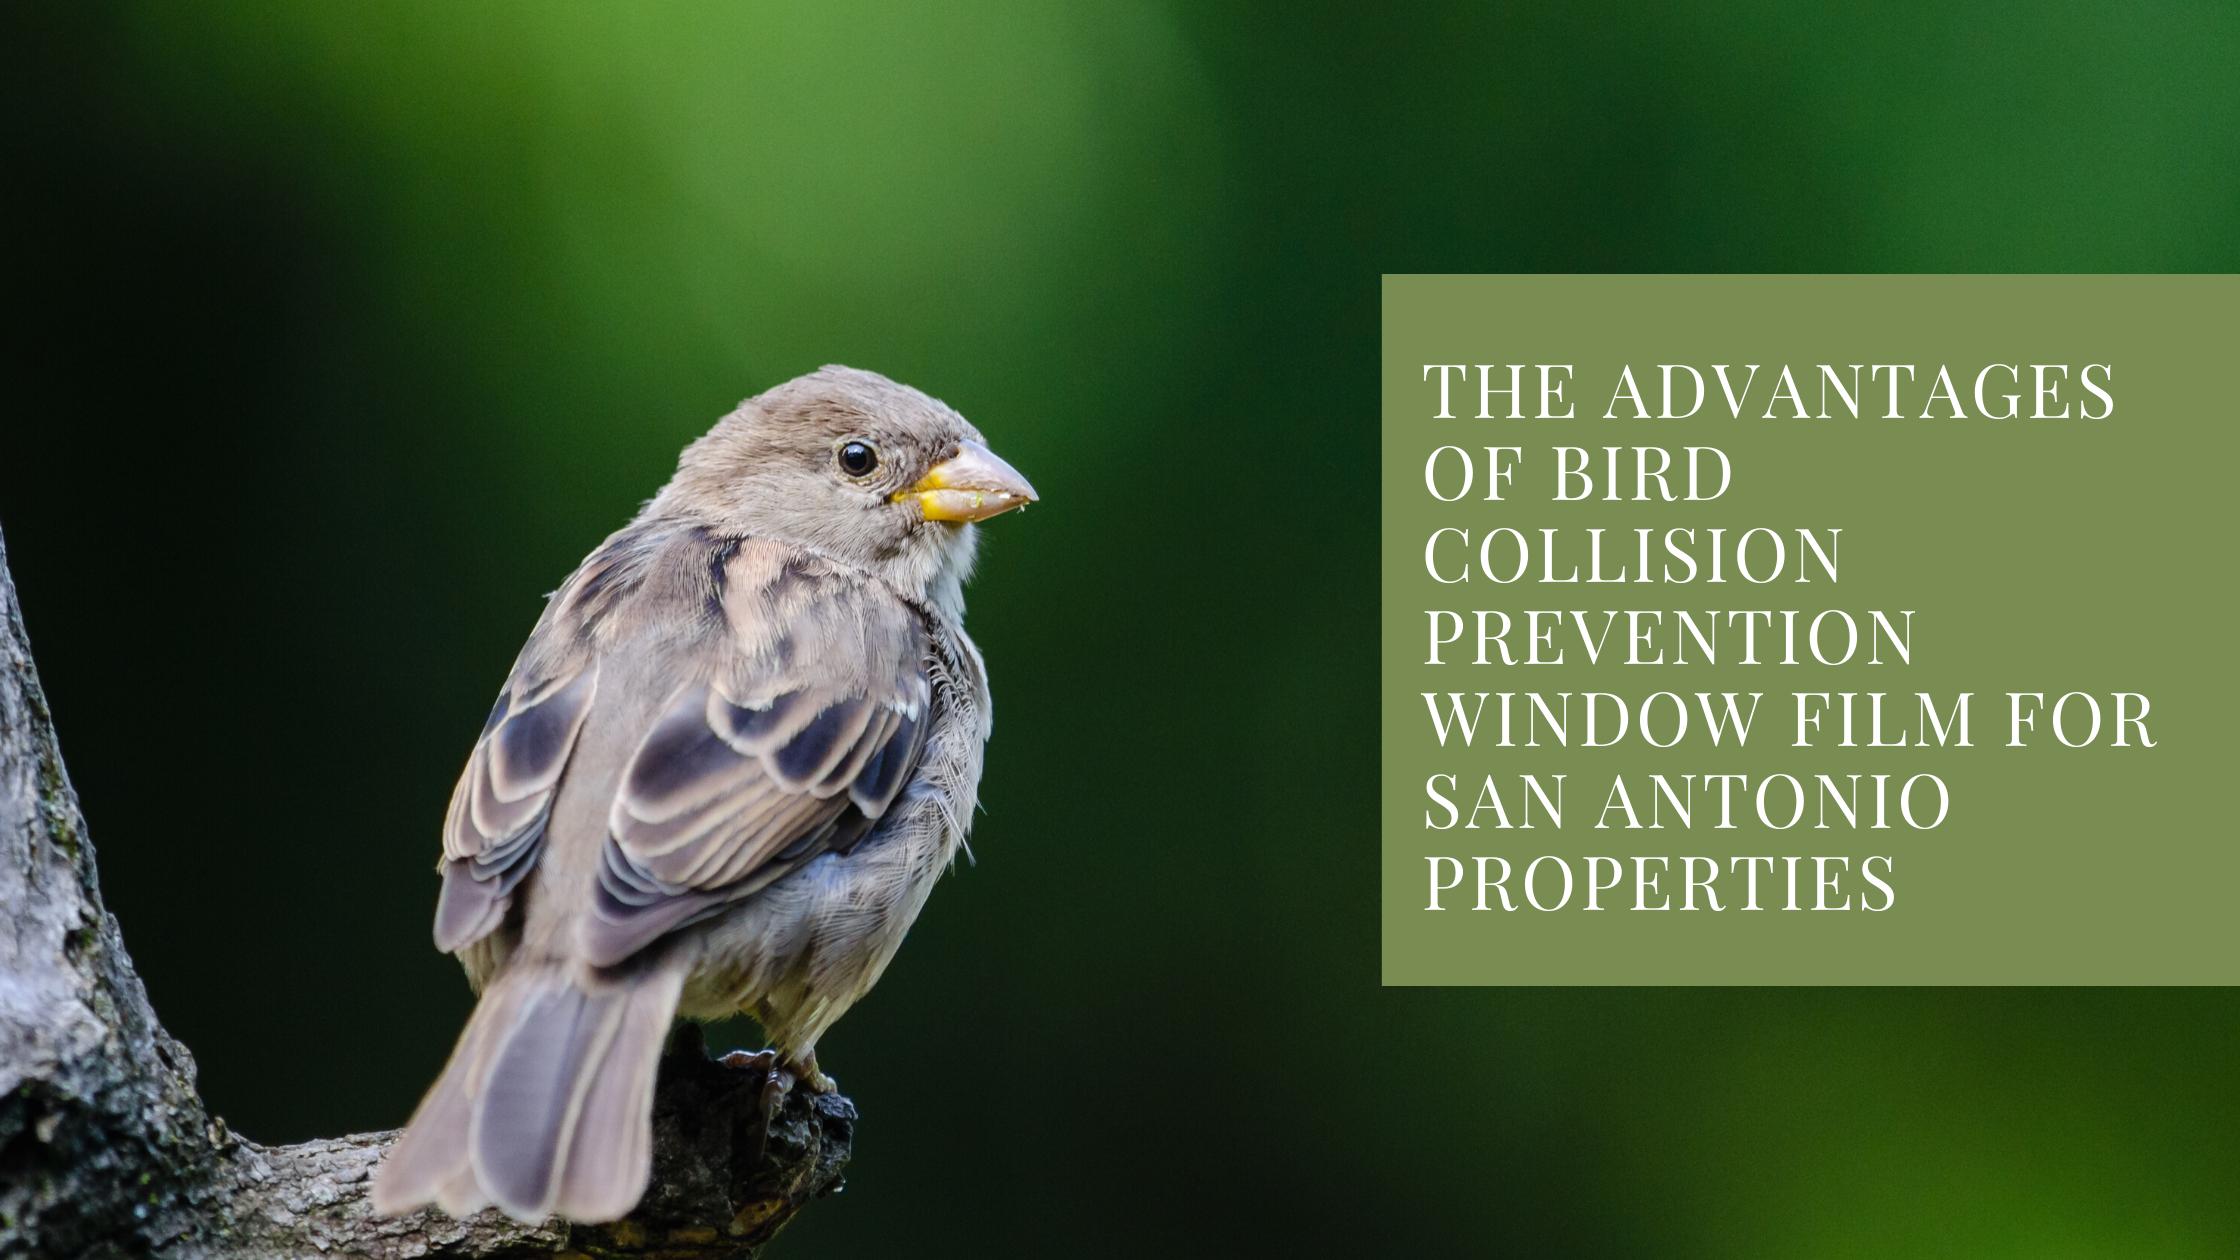 The Advantages of Bird Collision Prevention Window Film for San Antonio Properties